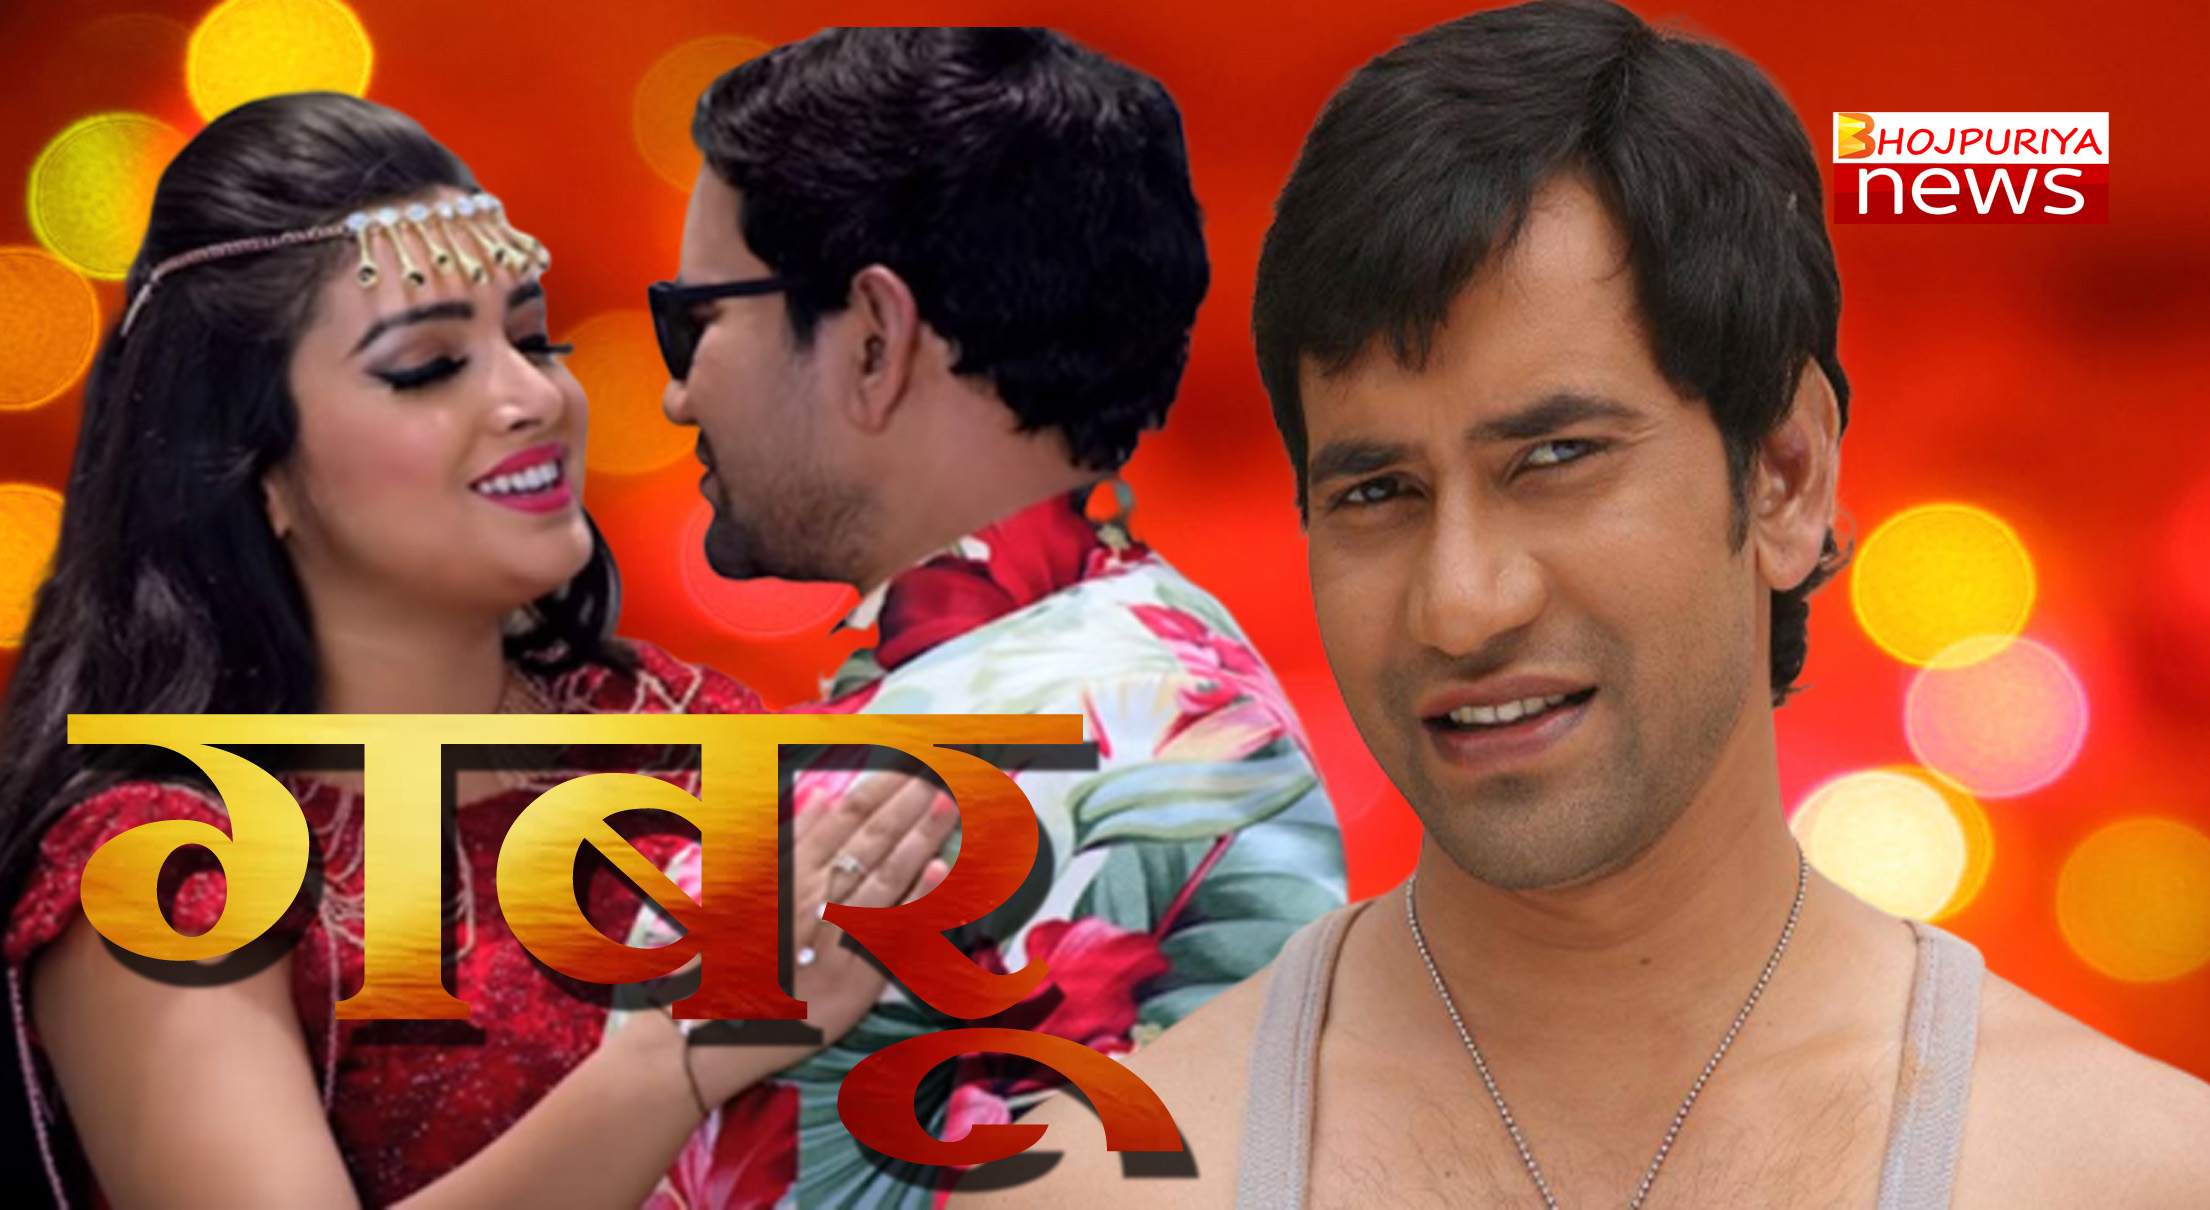 Gabru Bhojpuri Movie Wikipedia - Bhojpuri News, Bhojpuri Cinema News